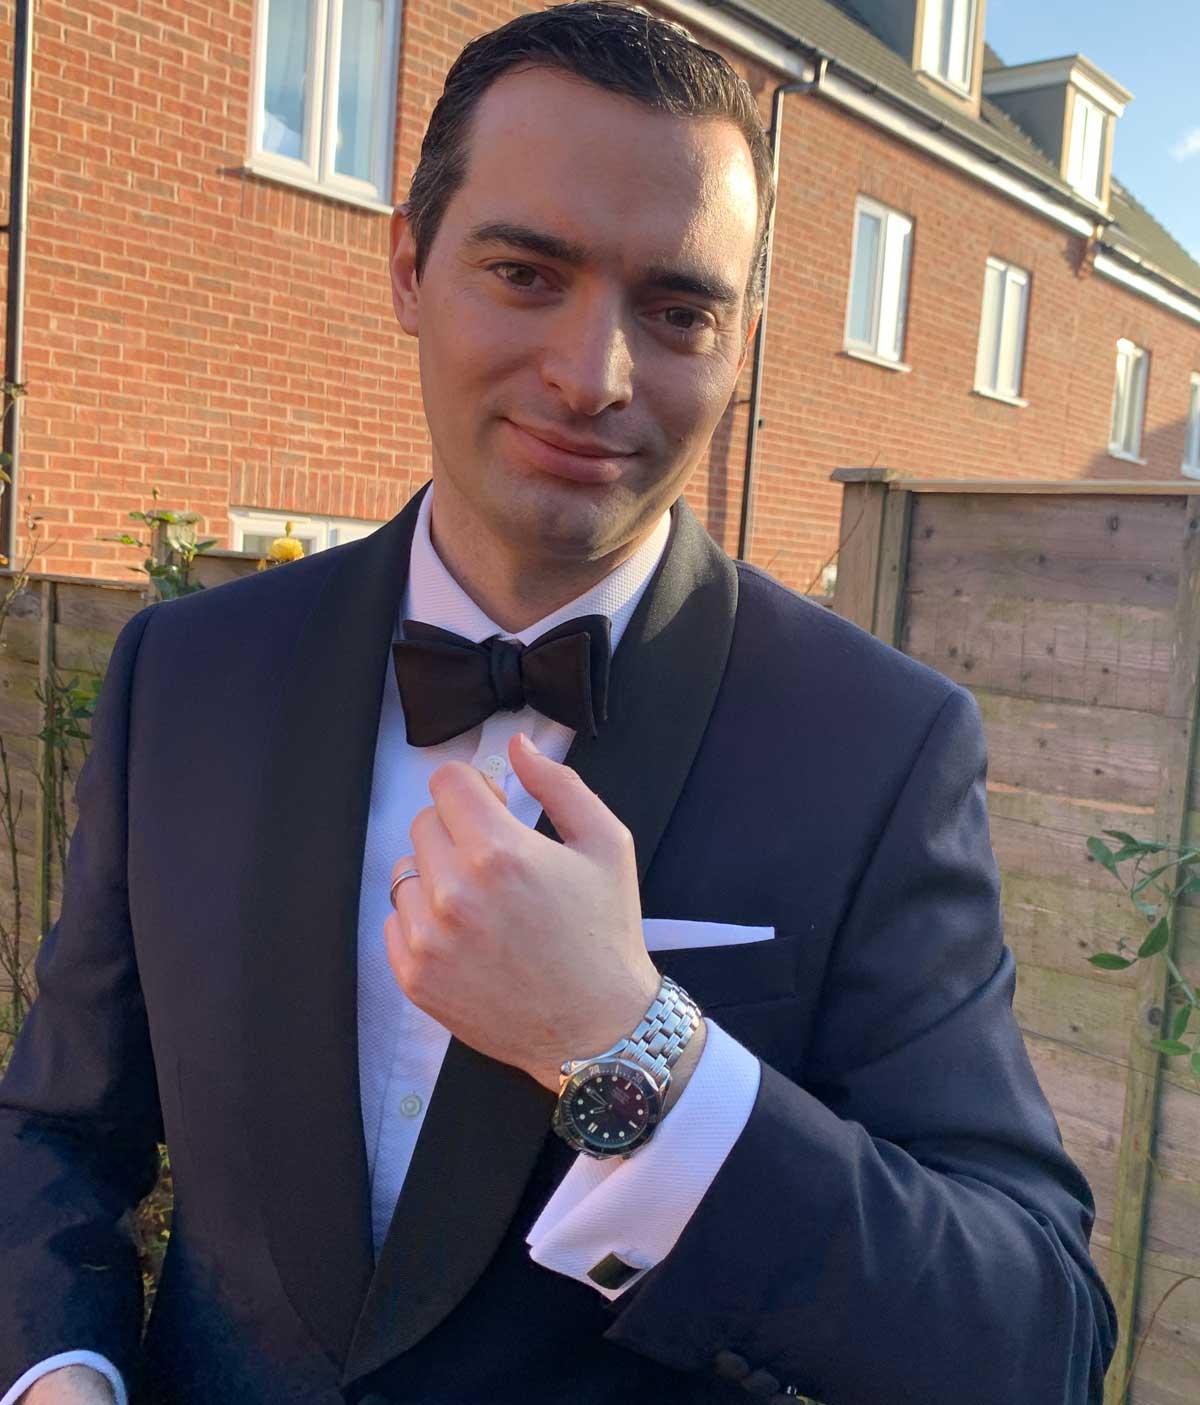 Cufflinks from Casino Royale tuxedo dressed up